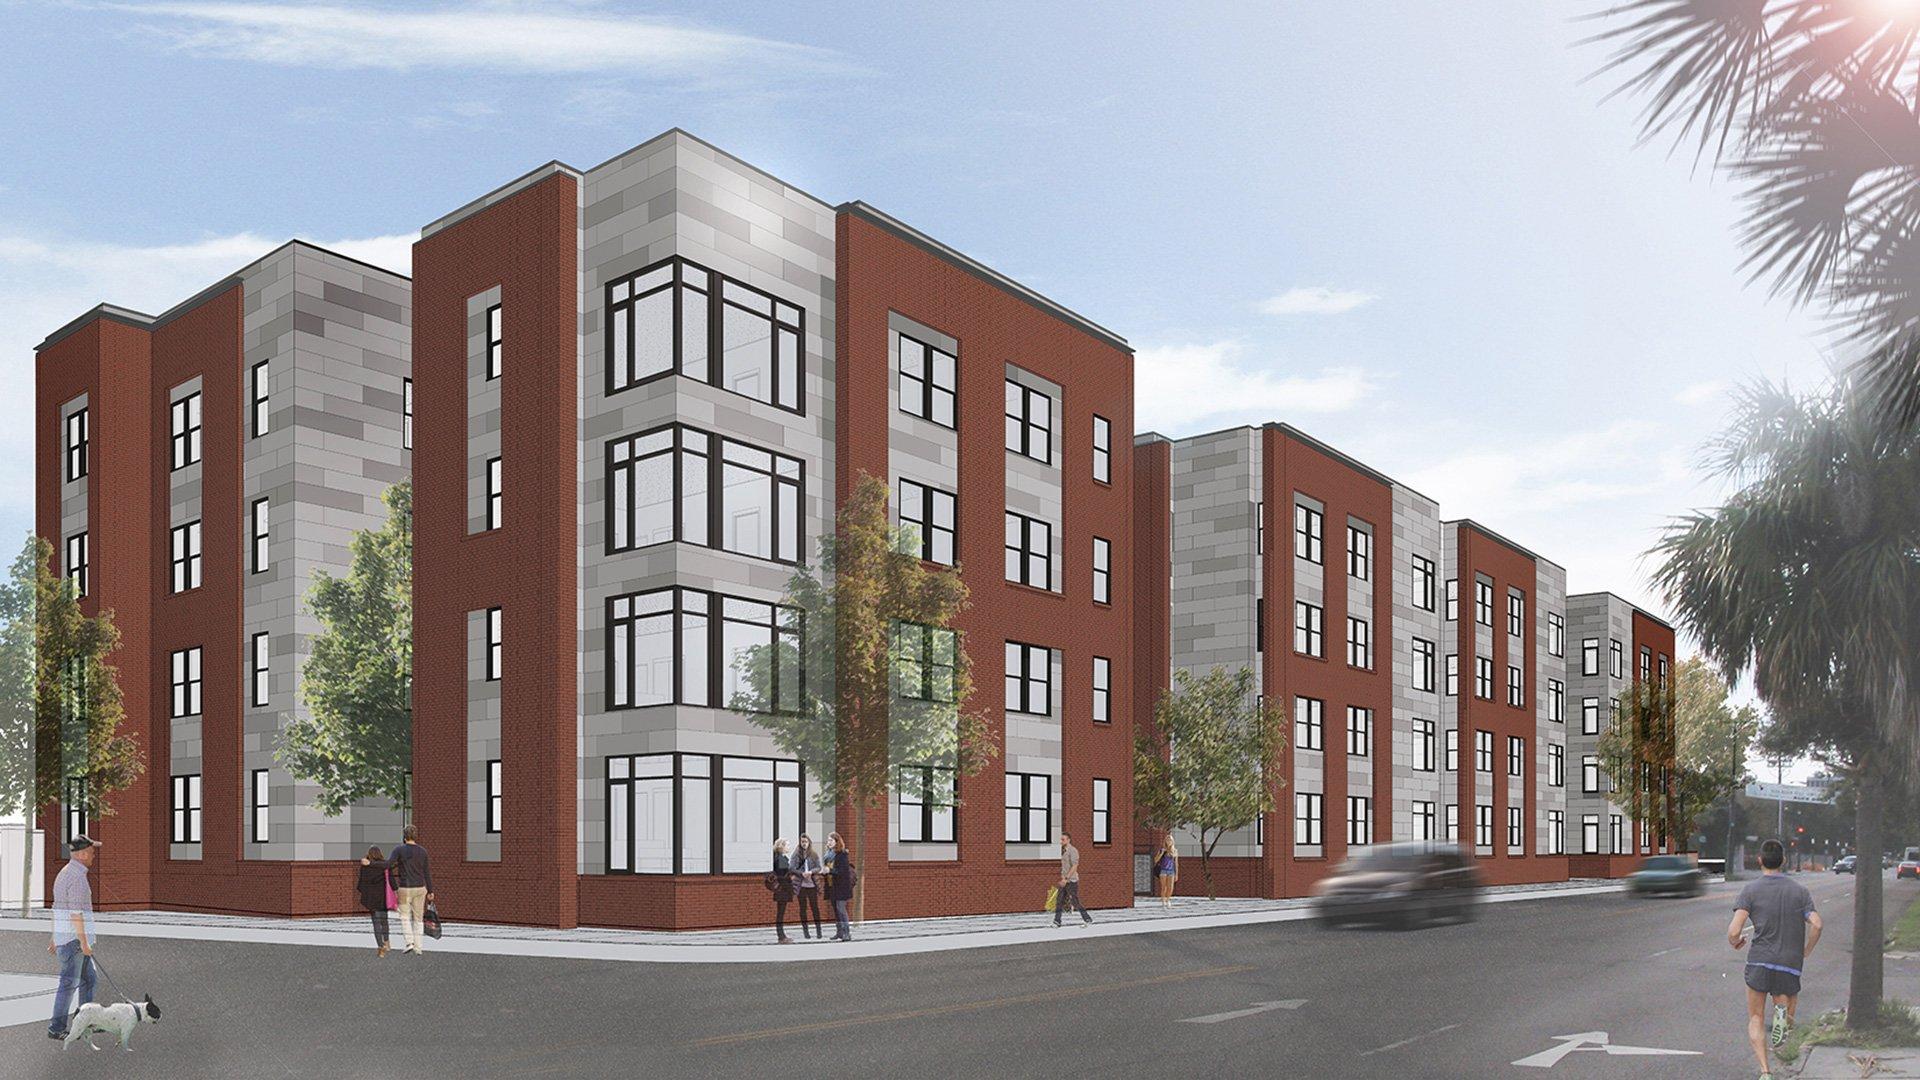 Meeting Street Student Housing Rendering - Charleston